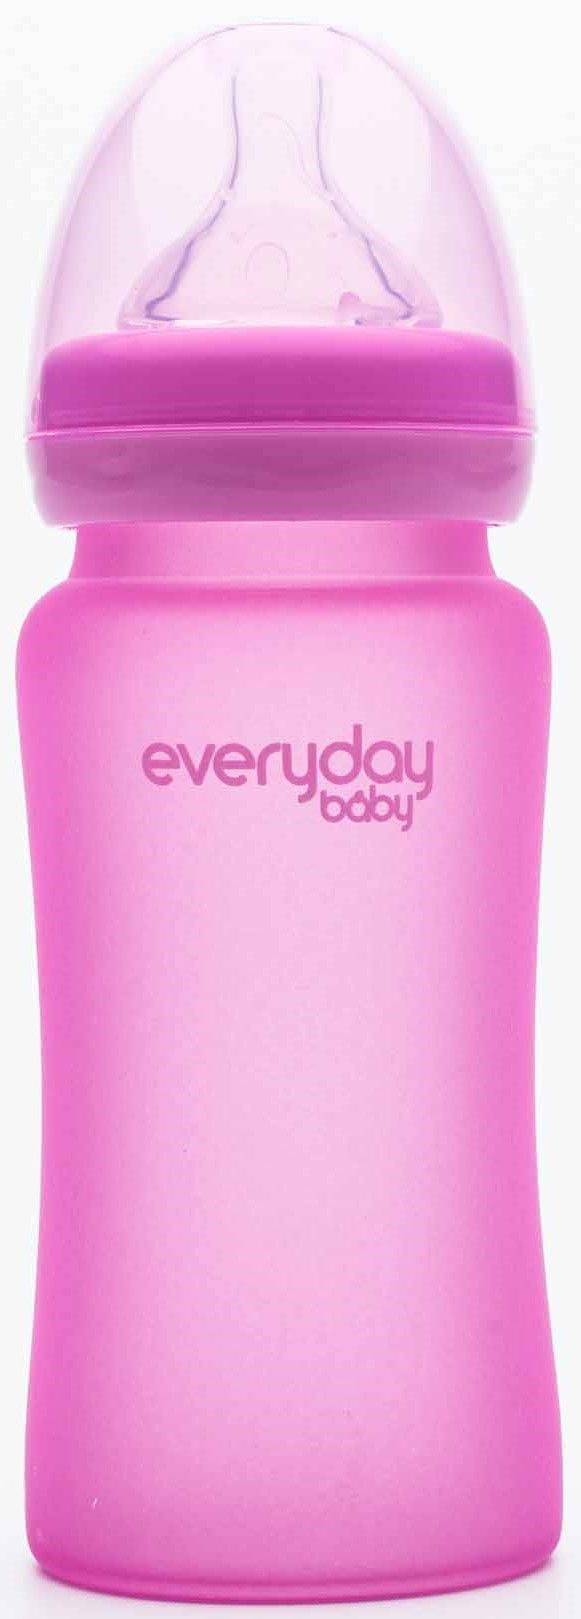 Everyday Baby Nappflaska Värmin 240ml, Cerise Pink